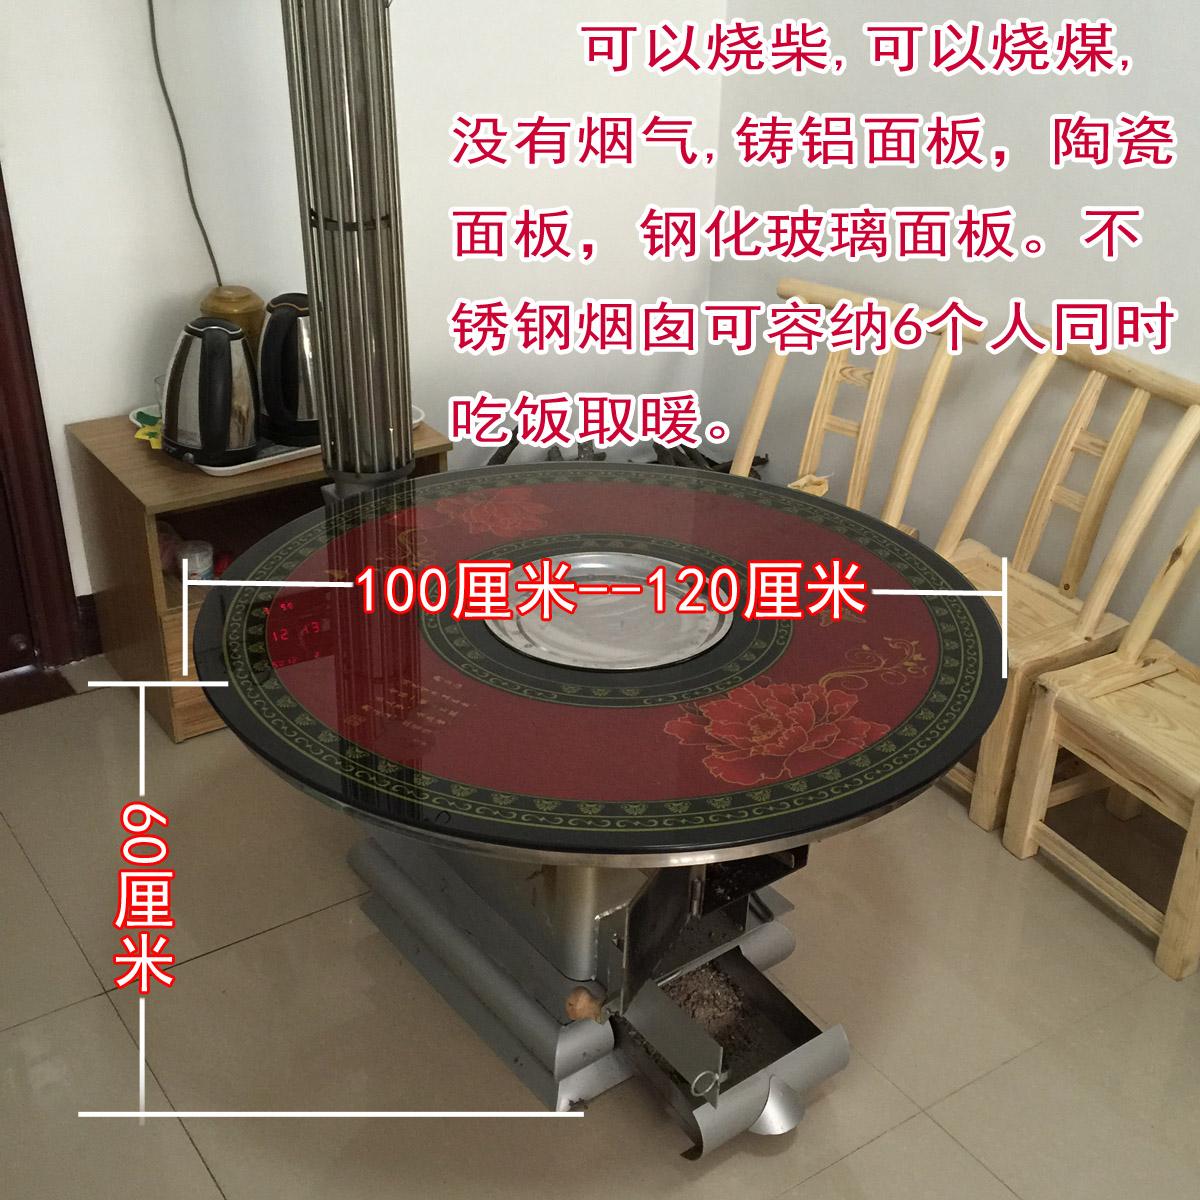 Hubei baking furnace wuhan hubei bcx laser marking machine bravo 200w laser welding machine for jewelry